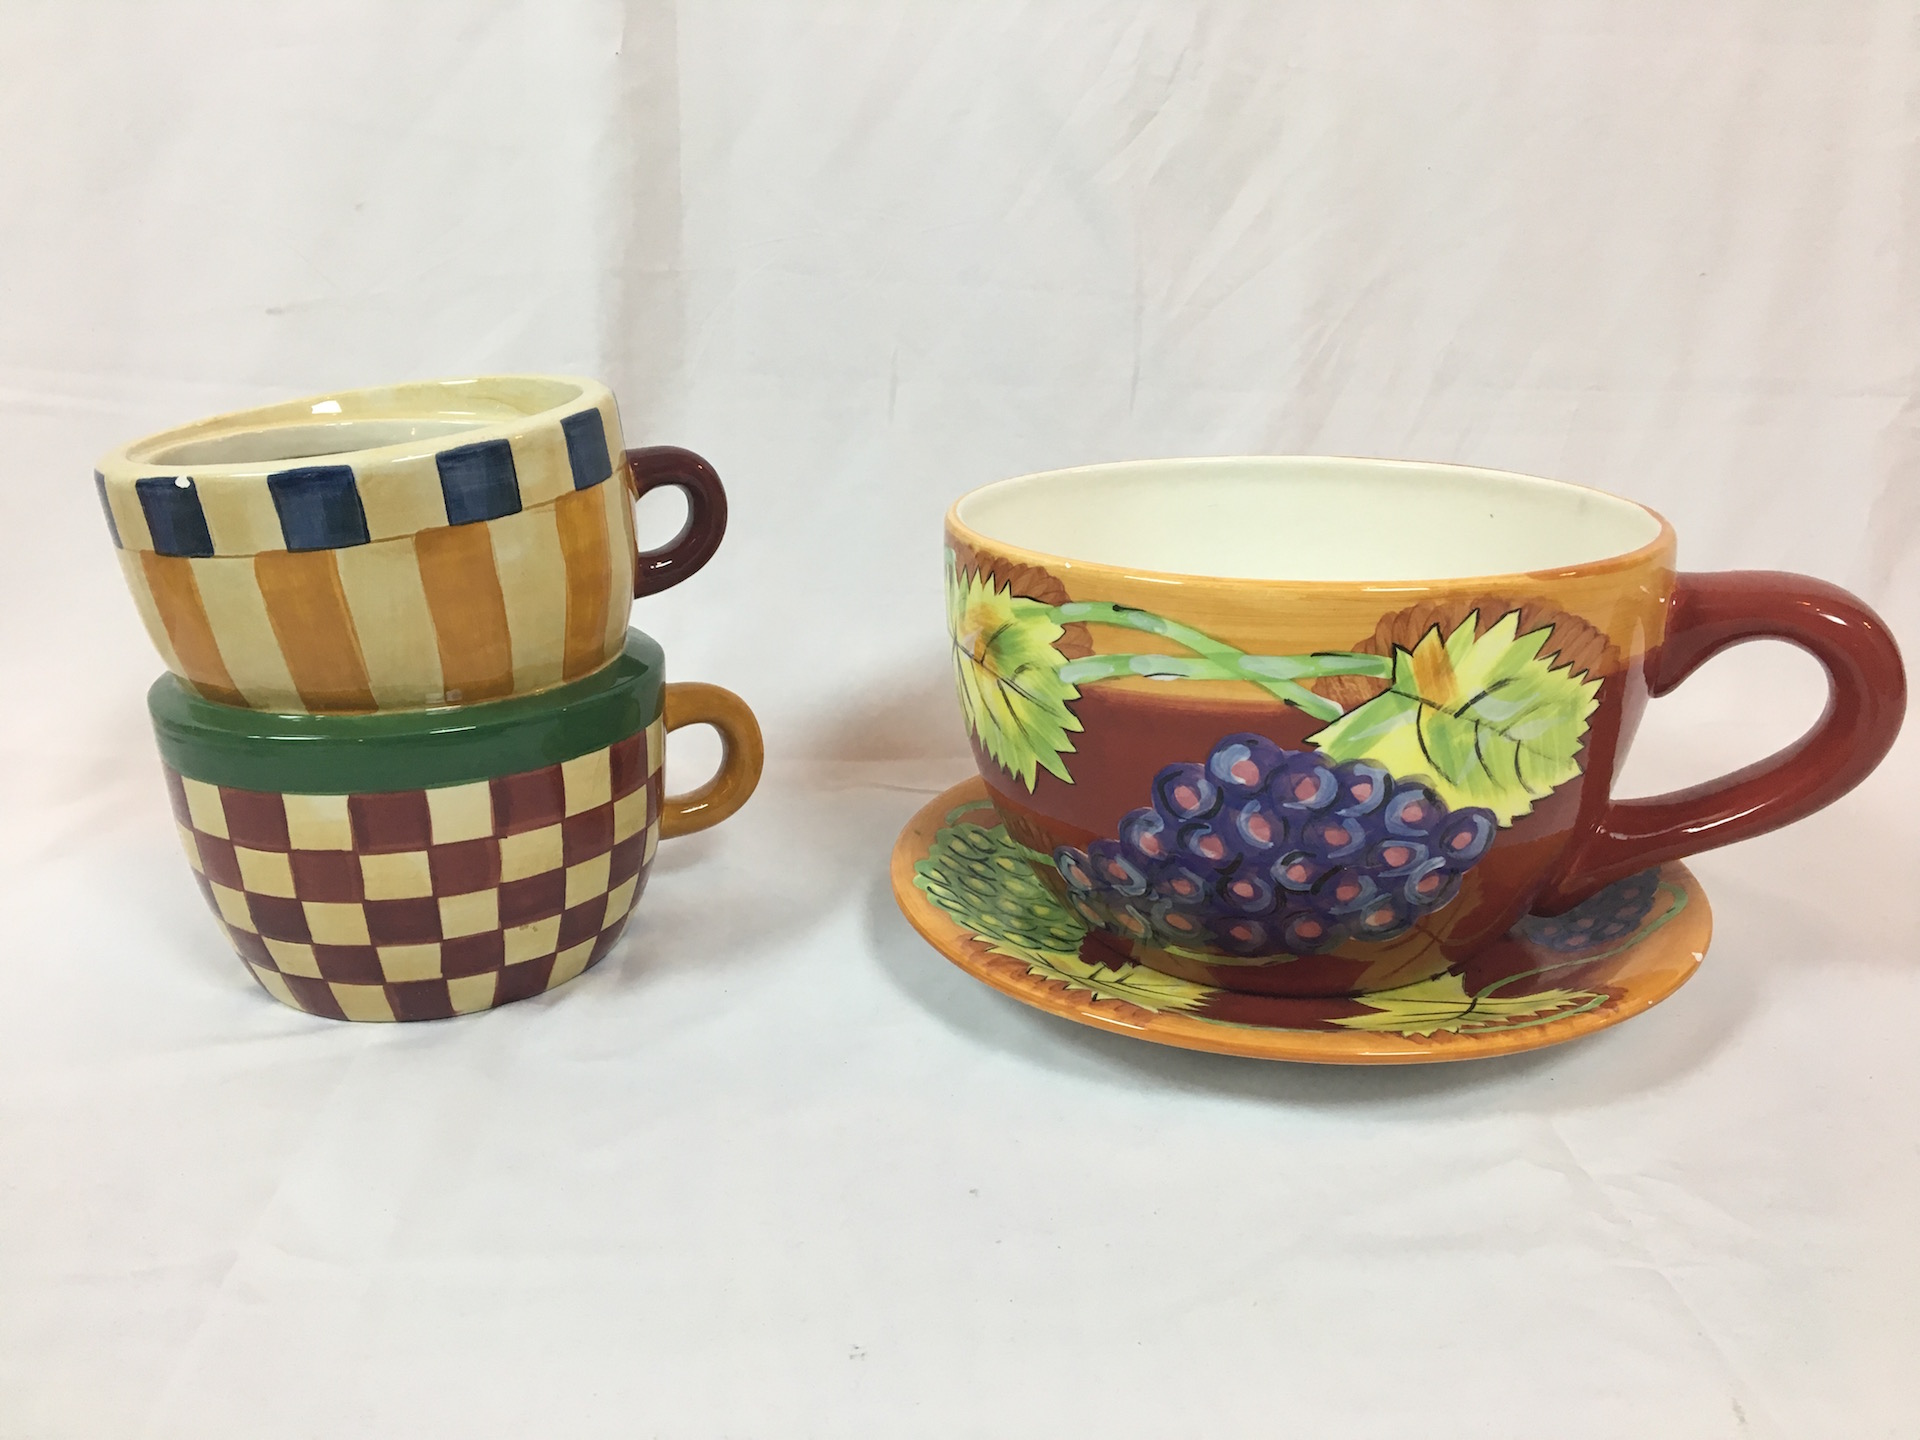 Alice, Oversized Unique Teacups